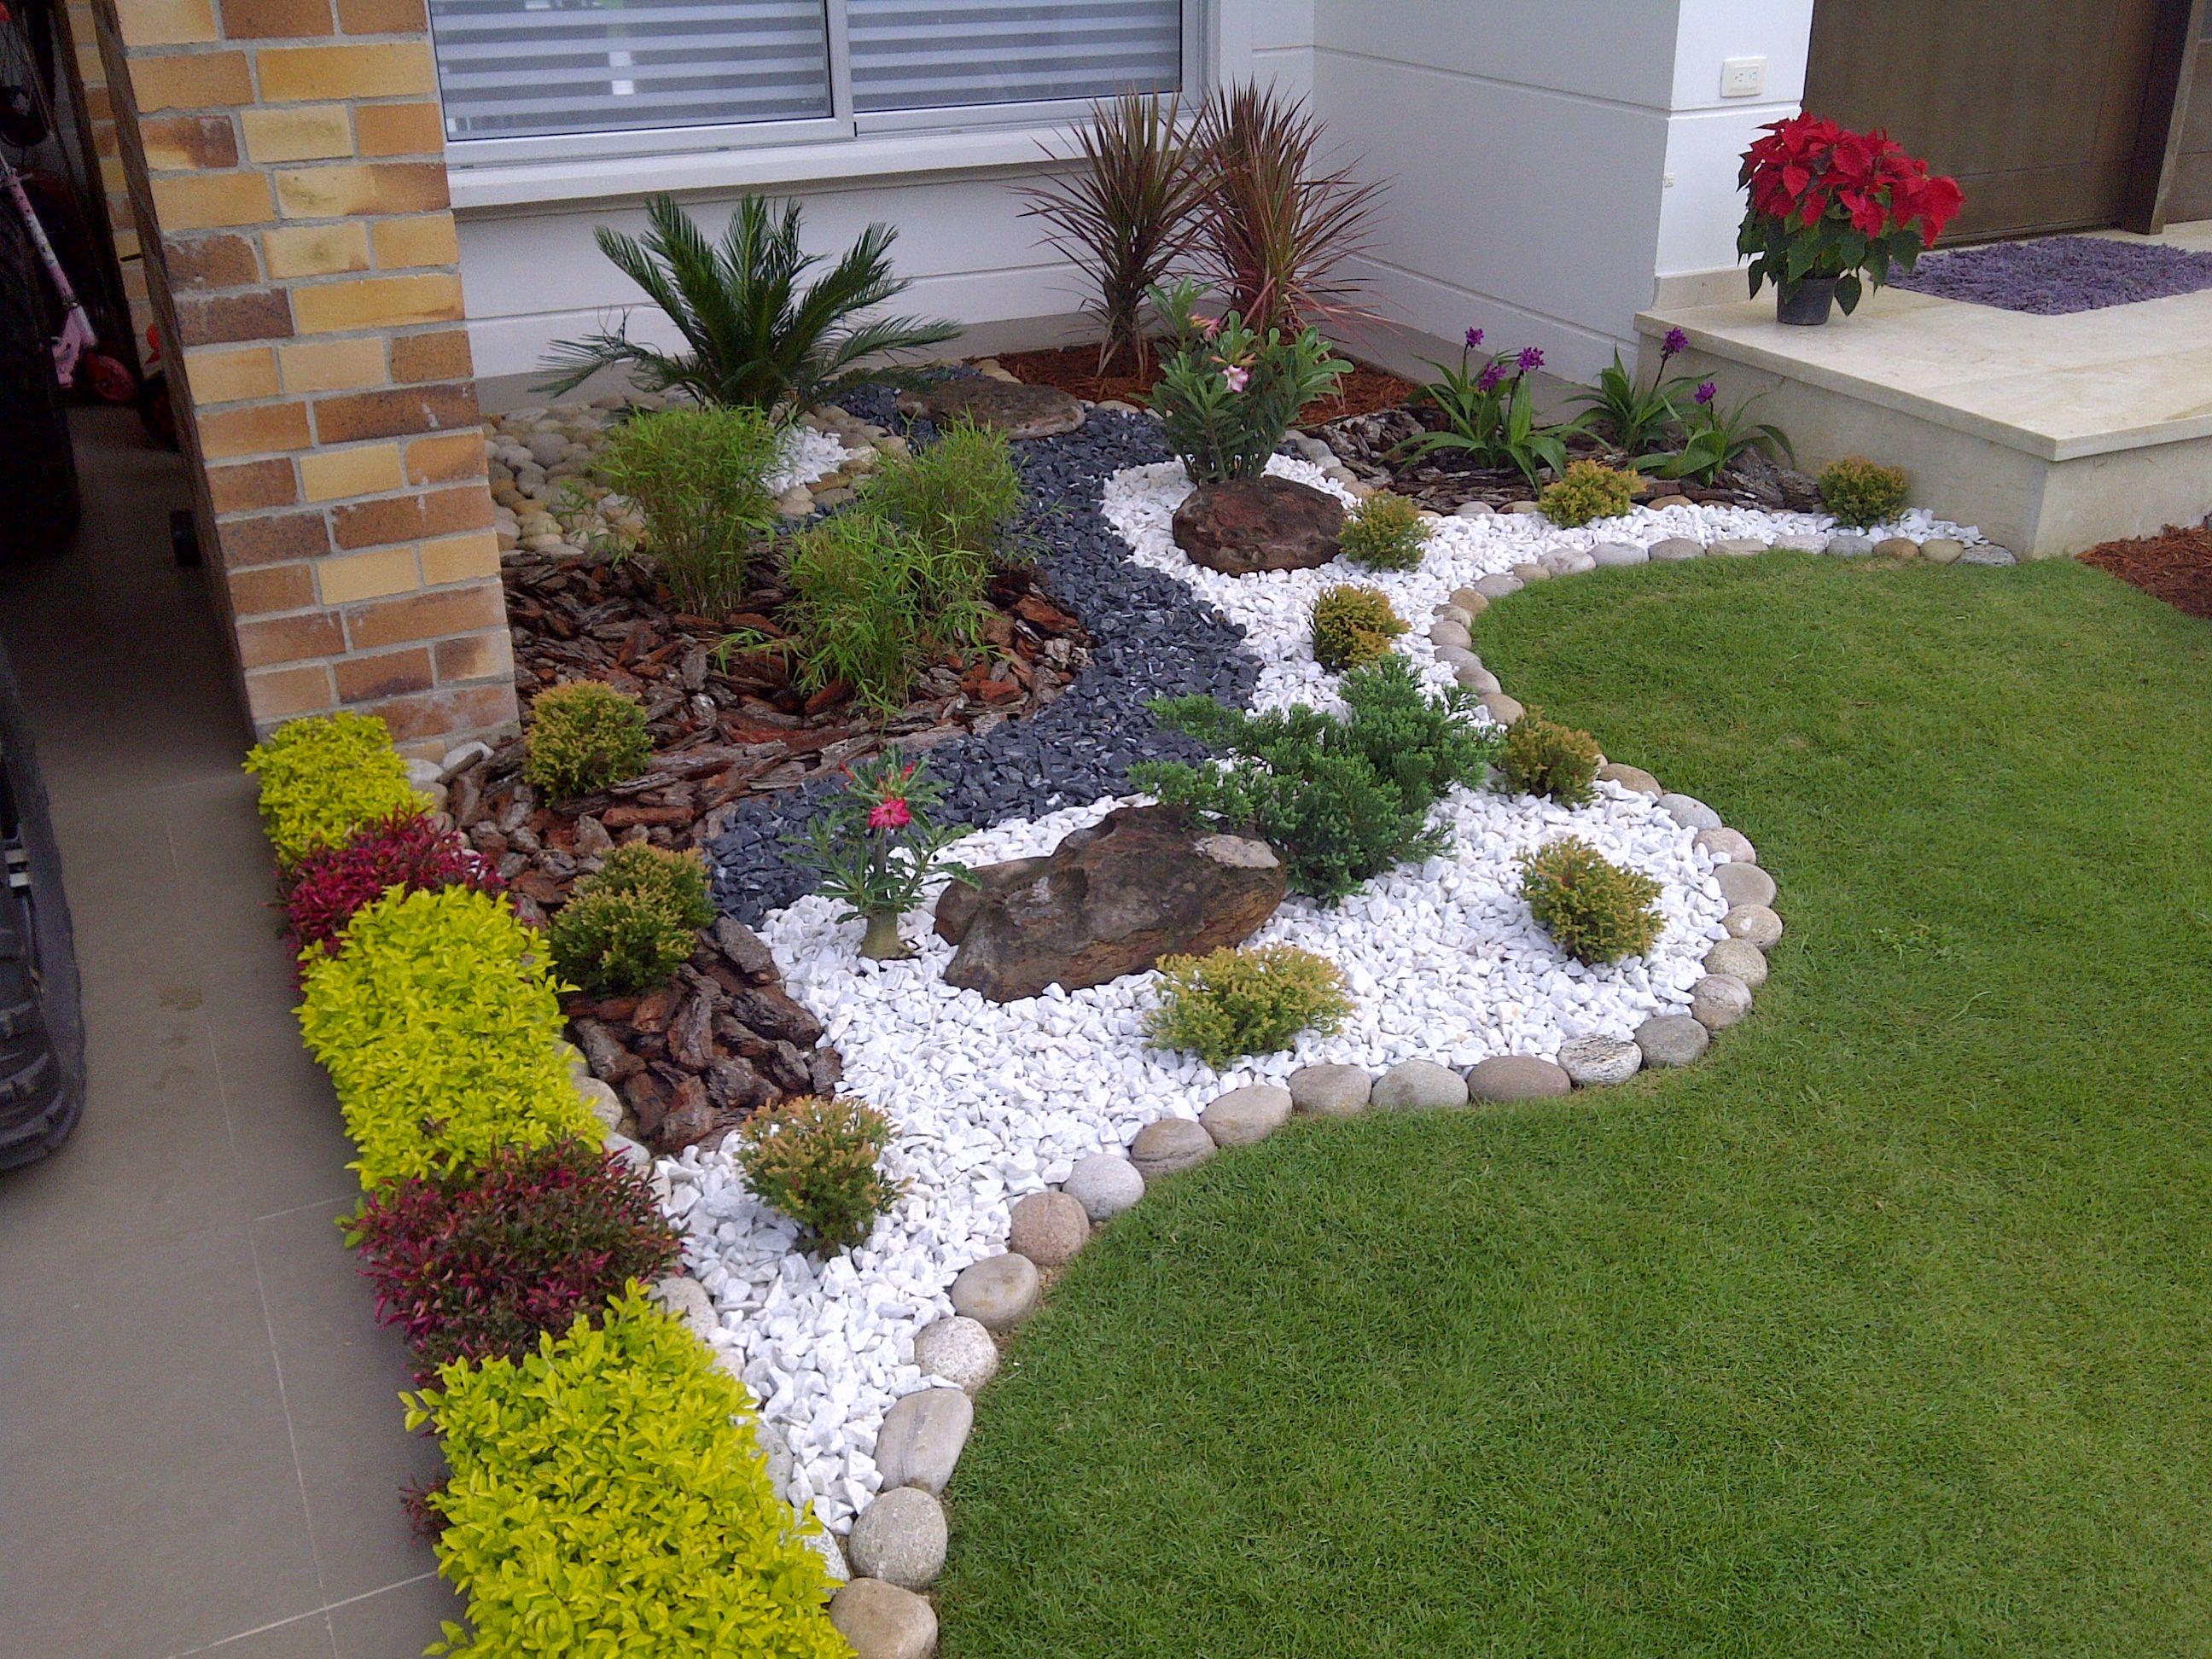 Dise o de jardines exteriores Servihouse de Colombia